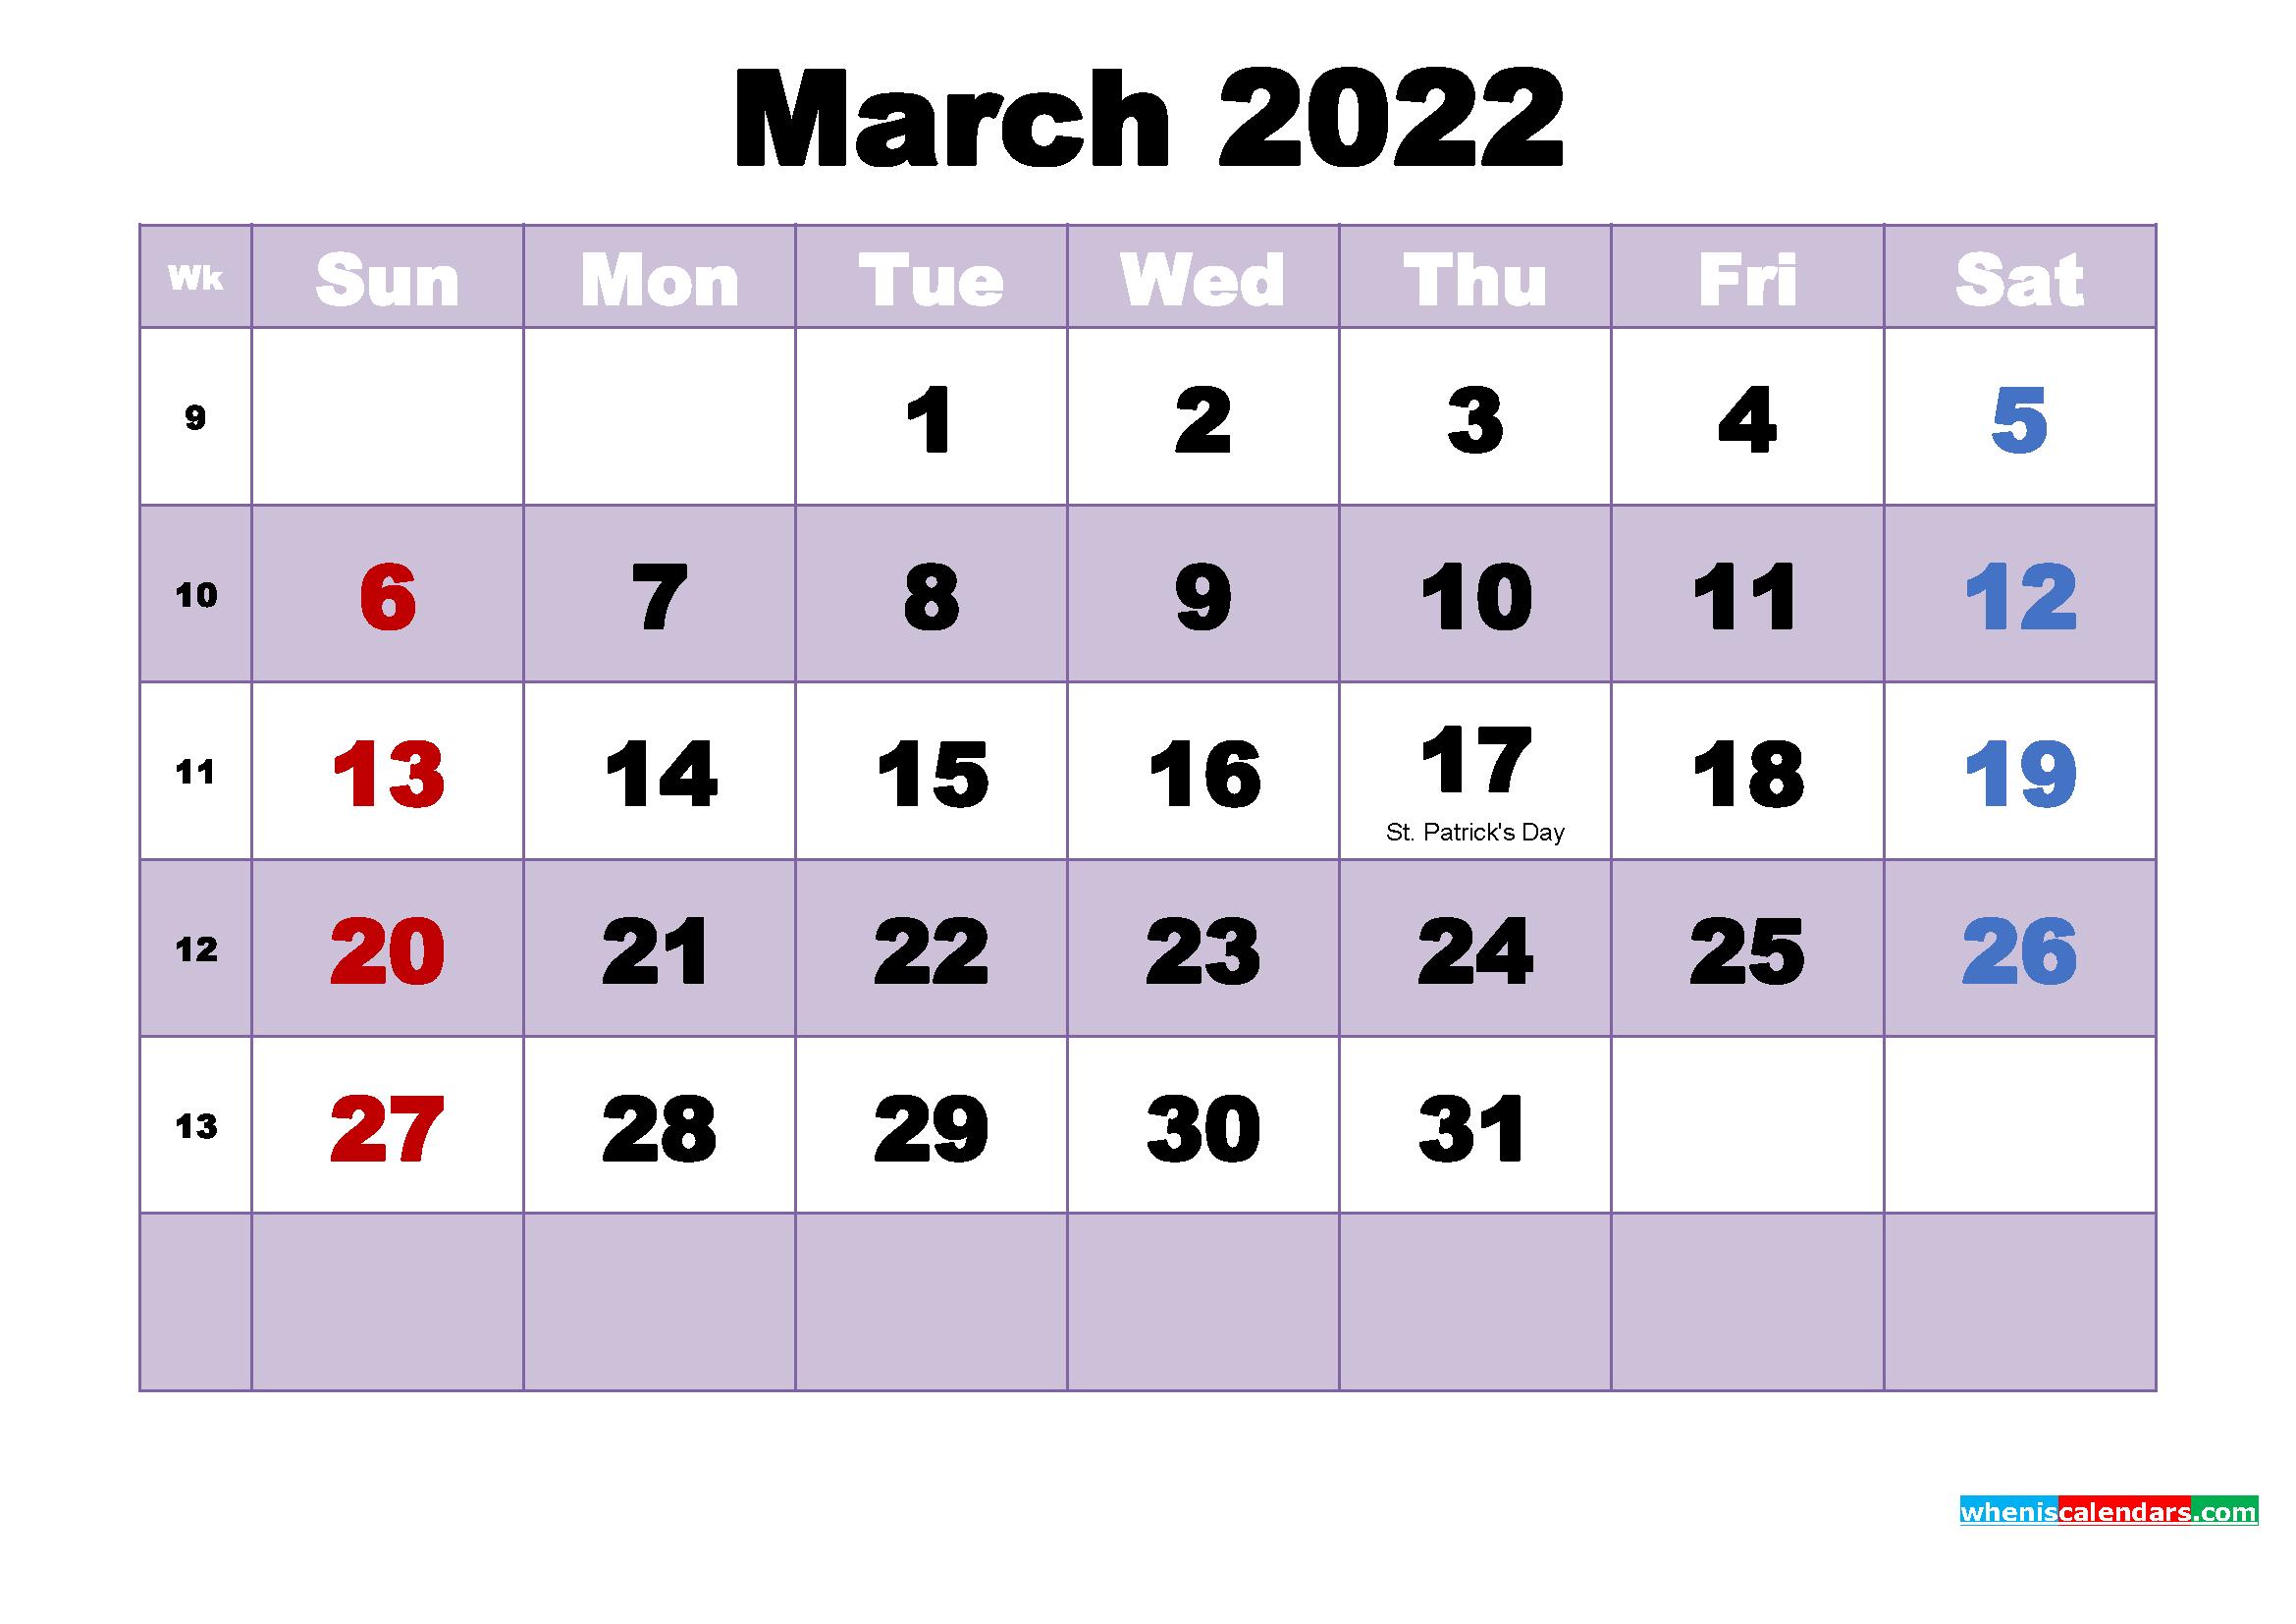 March 2022 Calendar Wallpaper Free Download